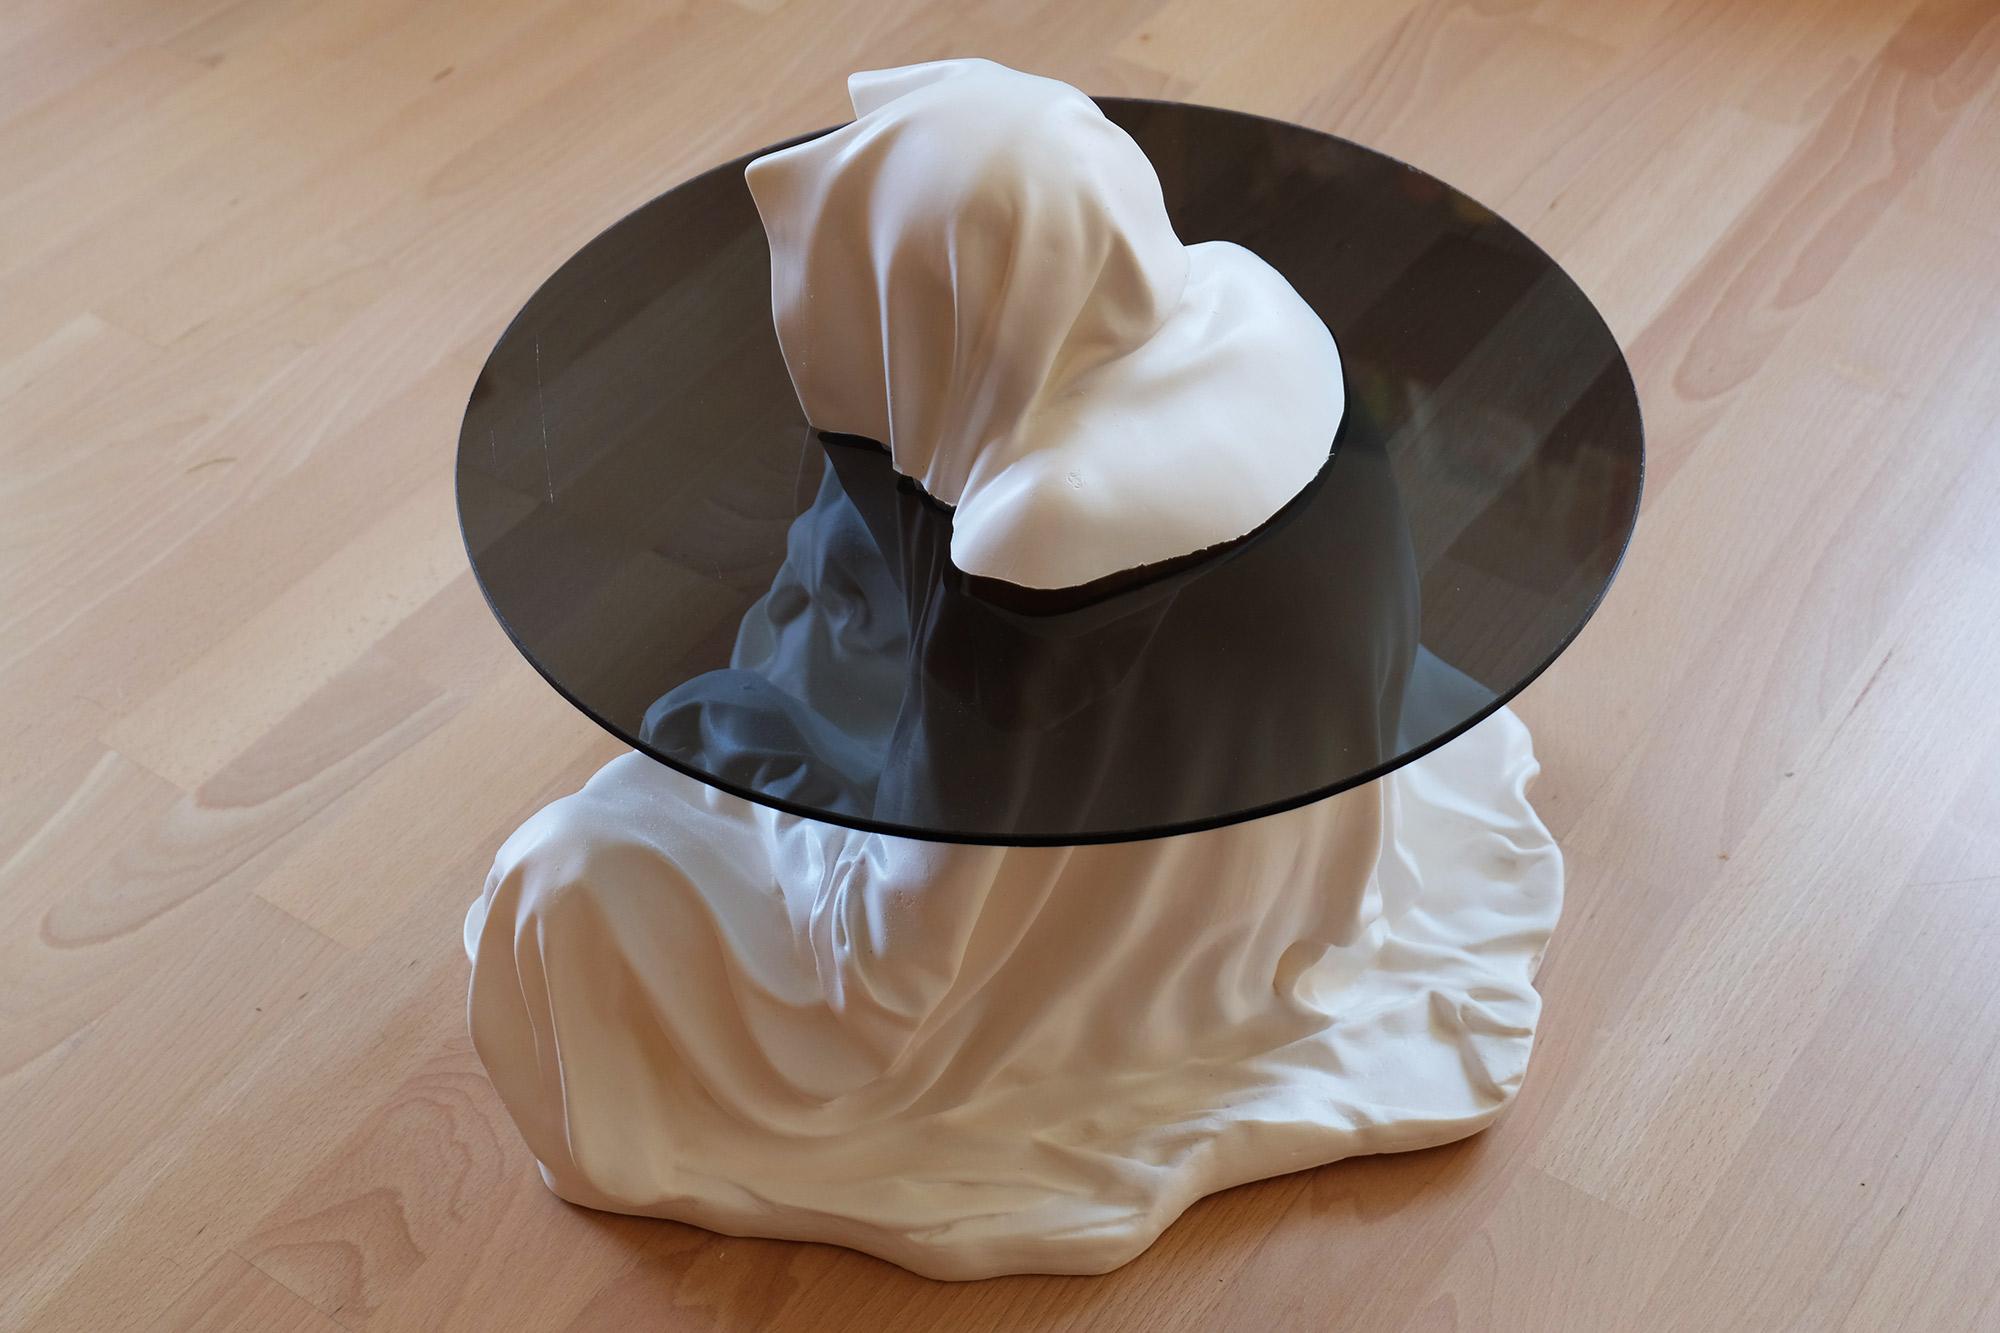 guardian-glass-tabel-furniture-modern-design-contemporary-art-arts-fineart-statue-sculpture-arte-manfred-kili-kielnhofer-7971